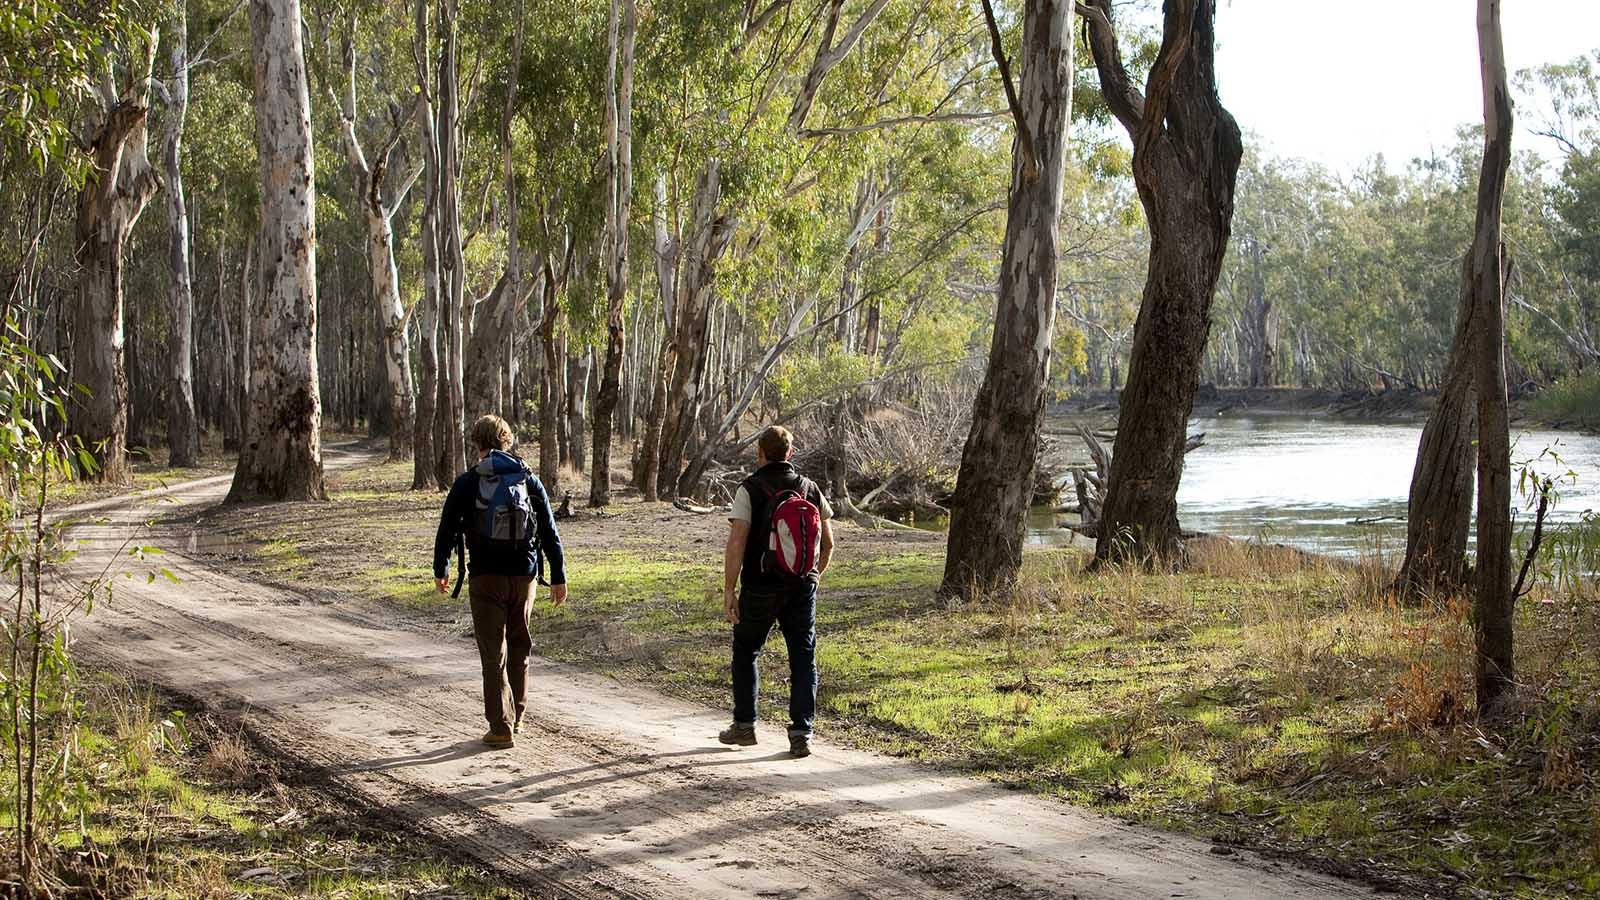 Barmah State Park, The Murray, Victoria, Australia